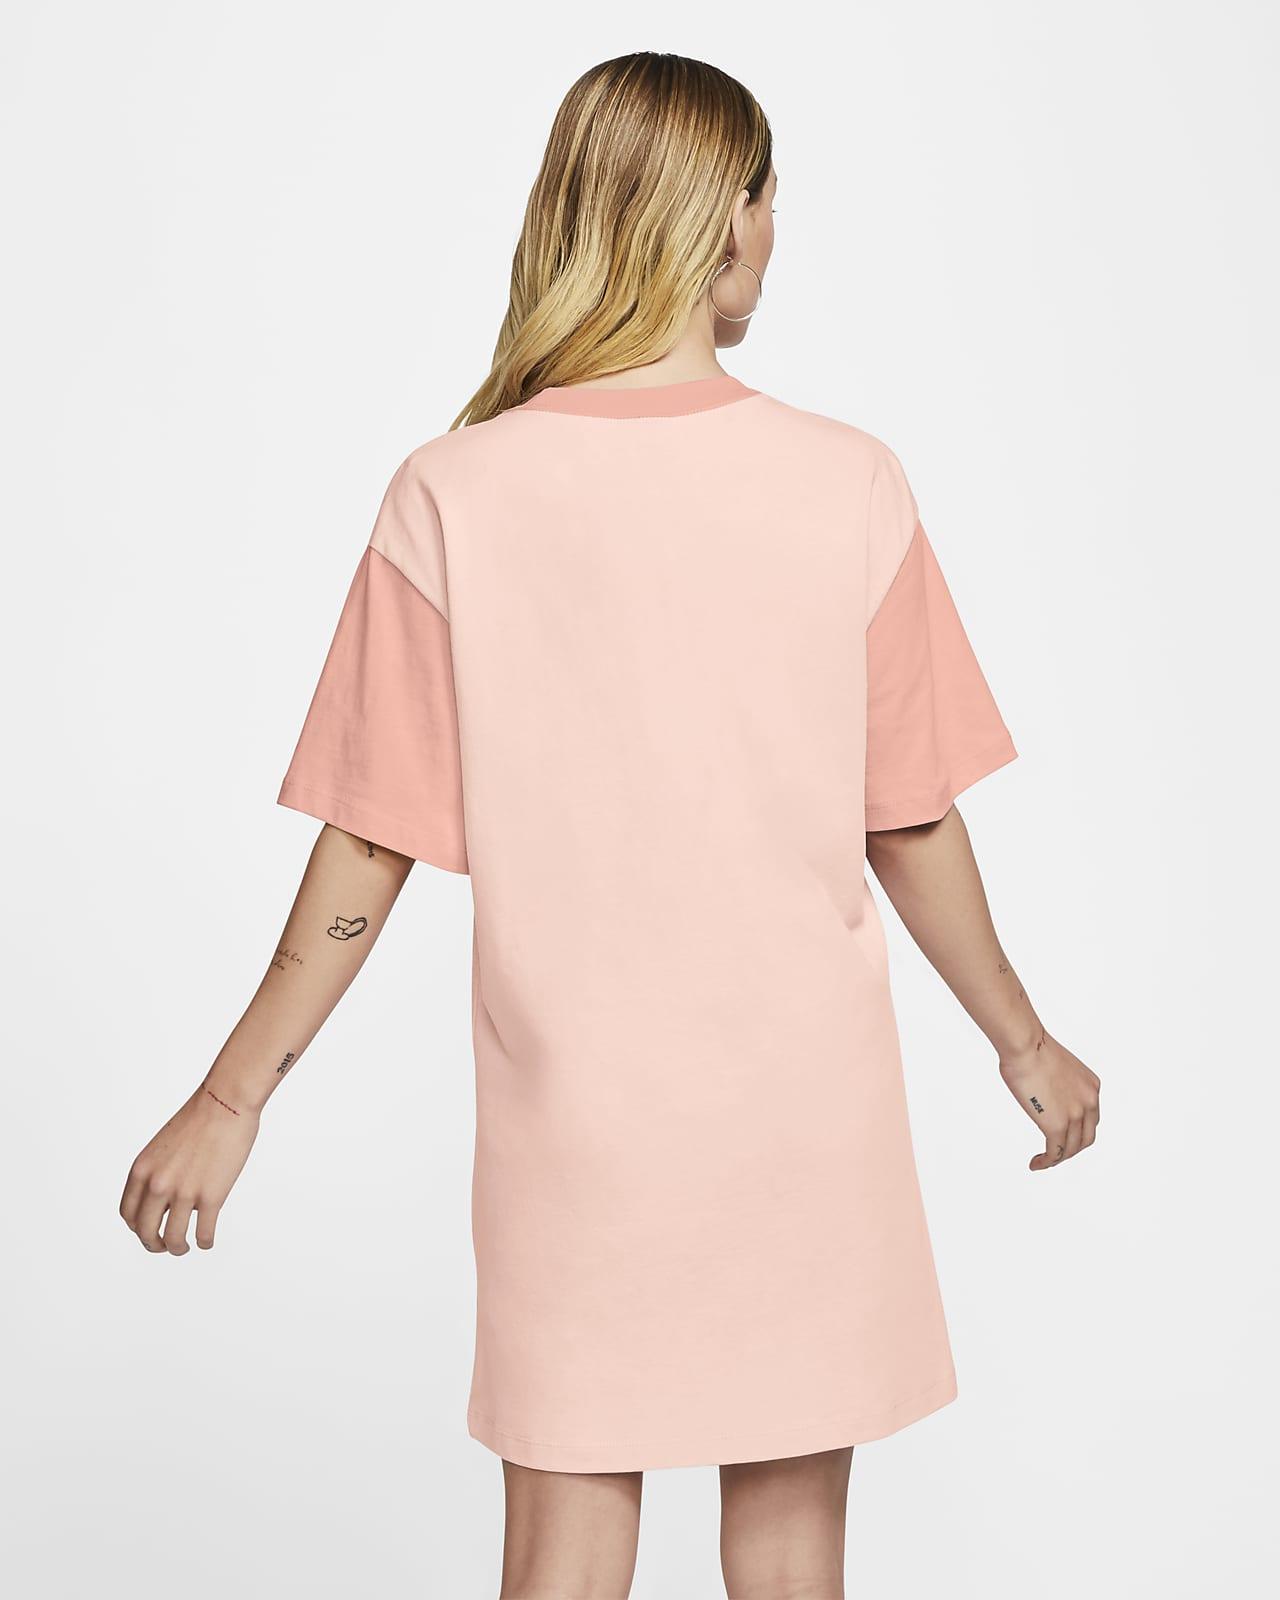 Robe à Swoosh Nike Sportswear pour Femme